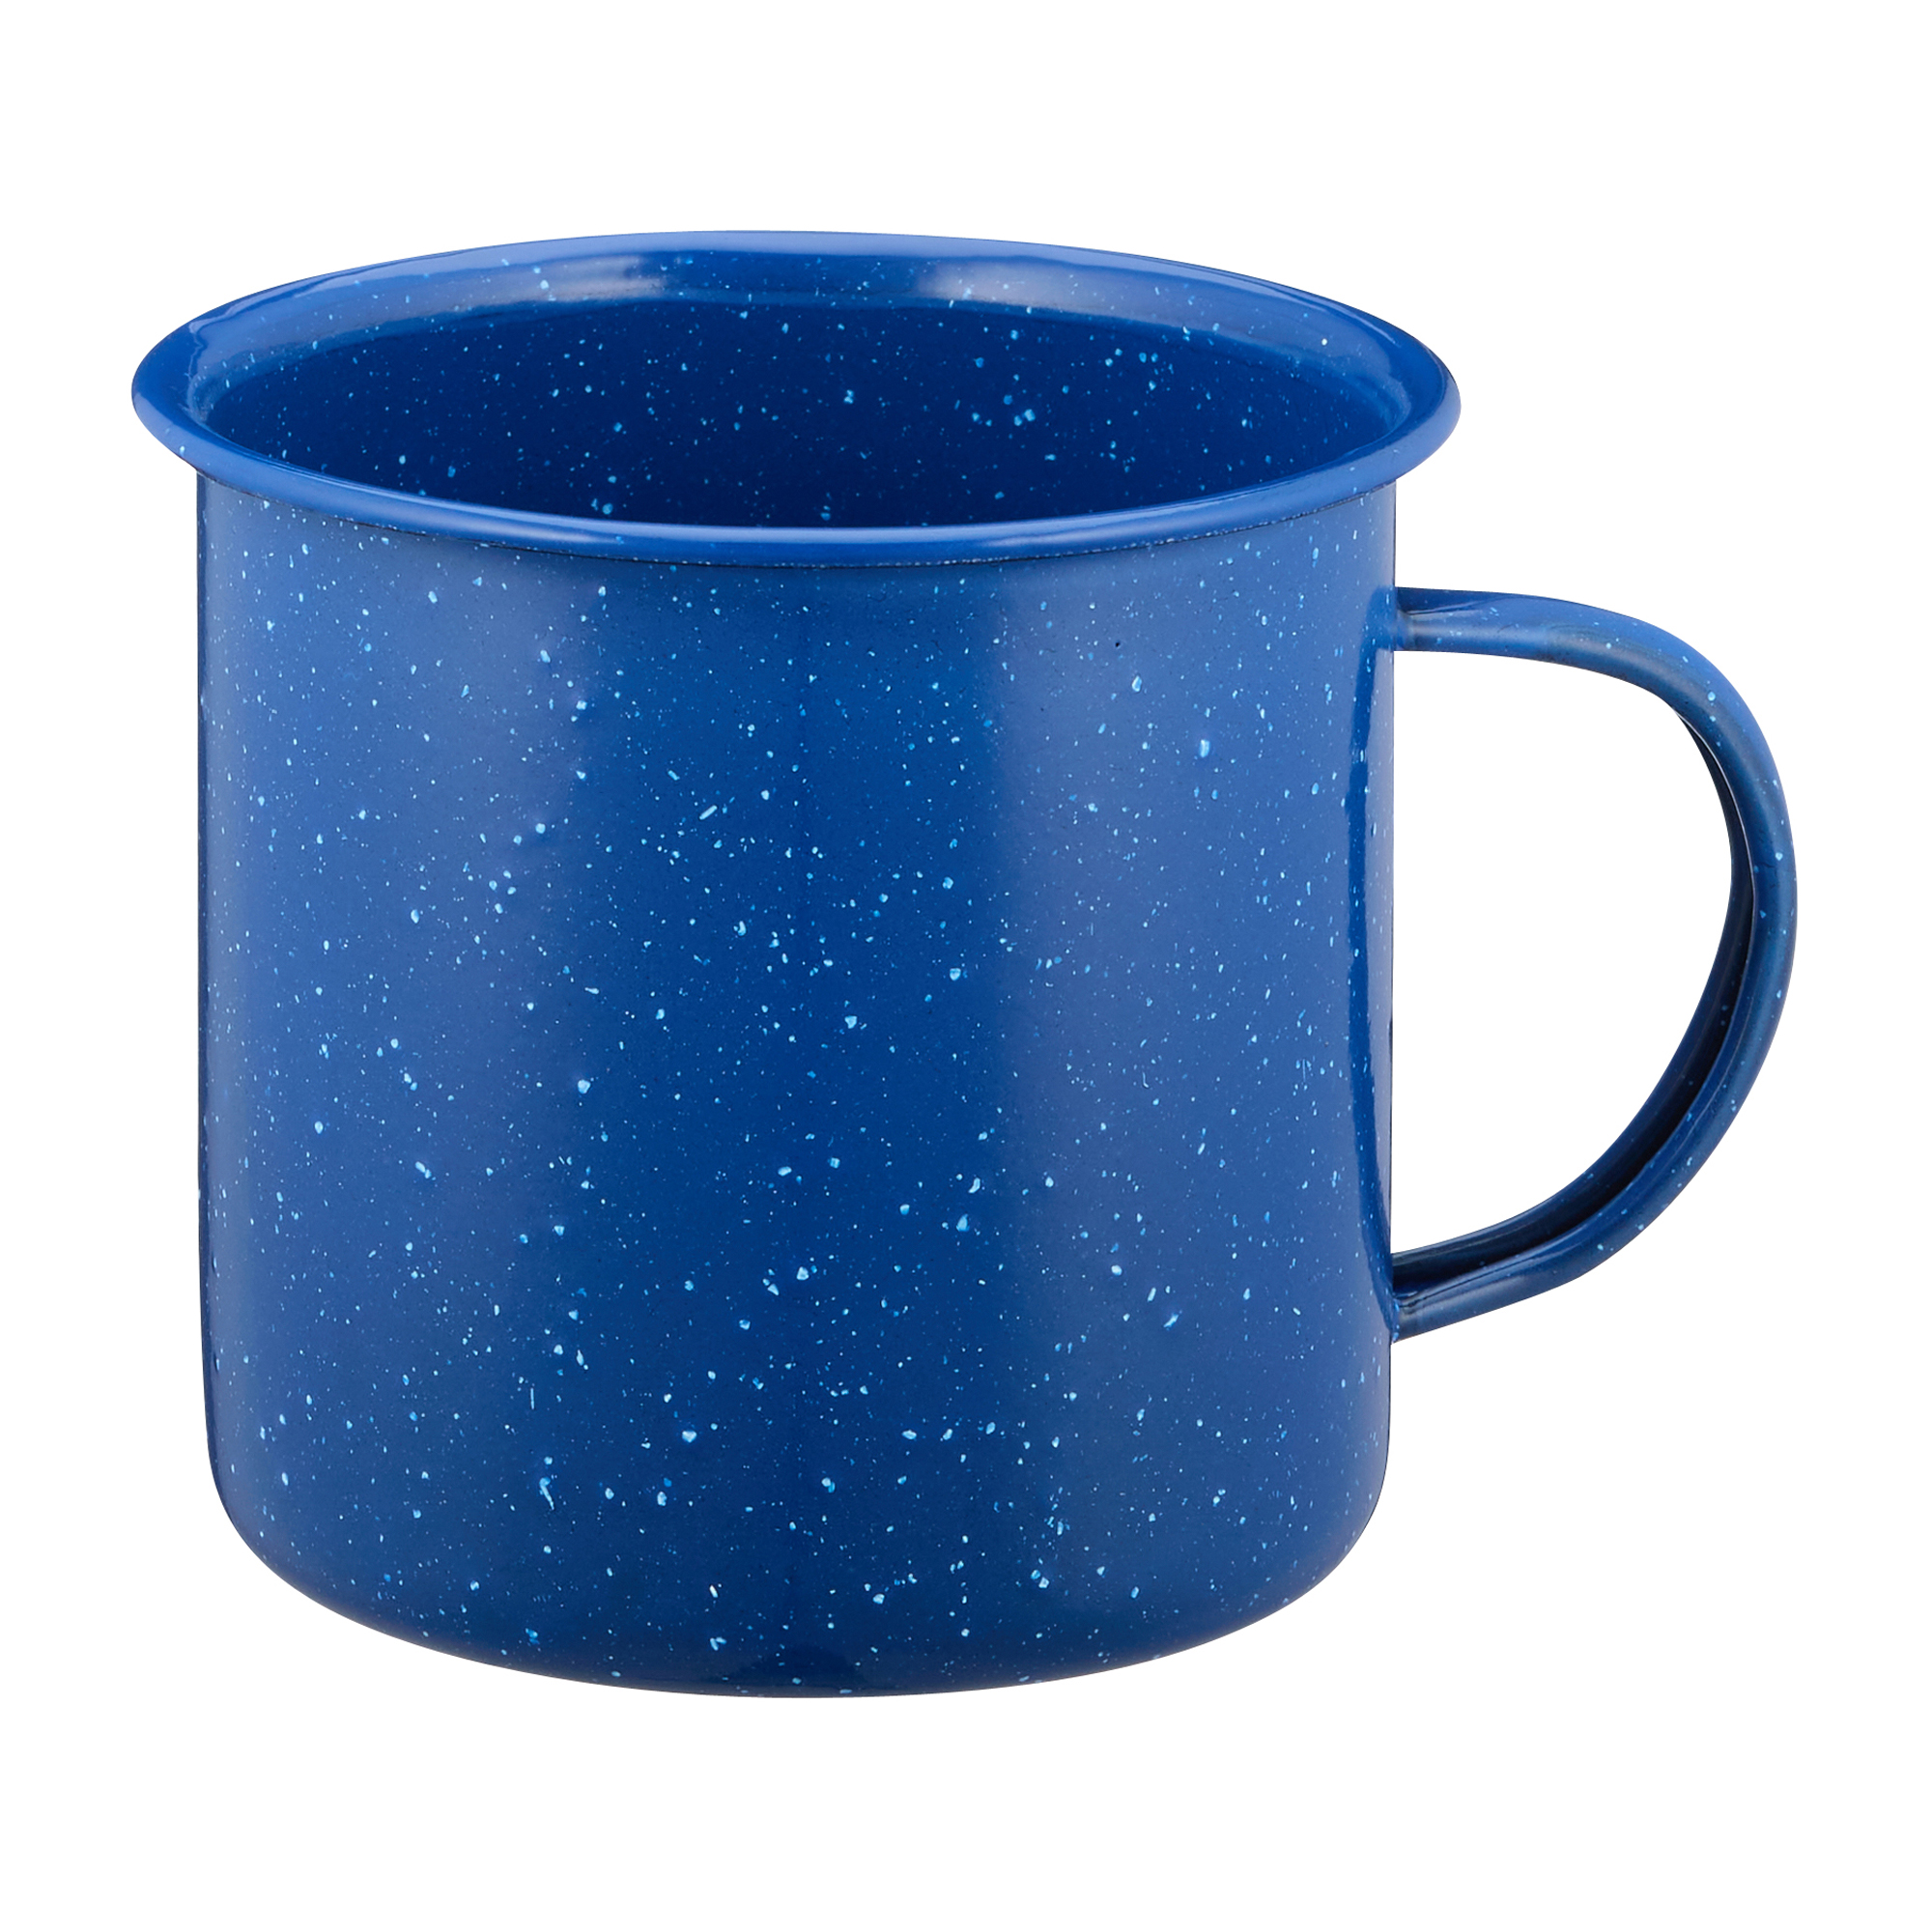 Emaille Tasse Western 680 ml blau